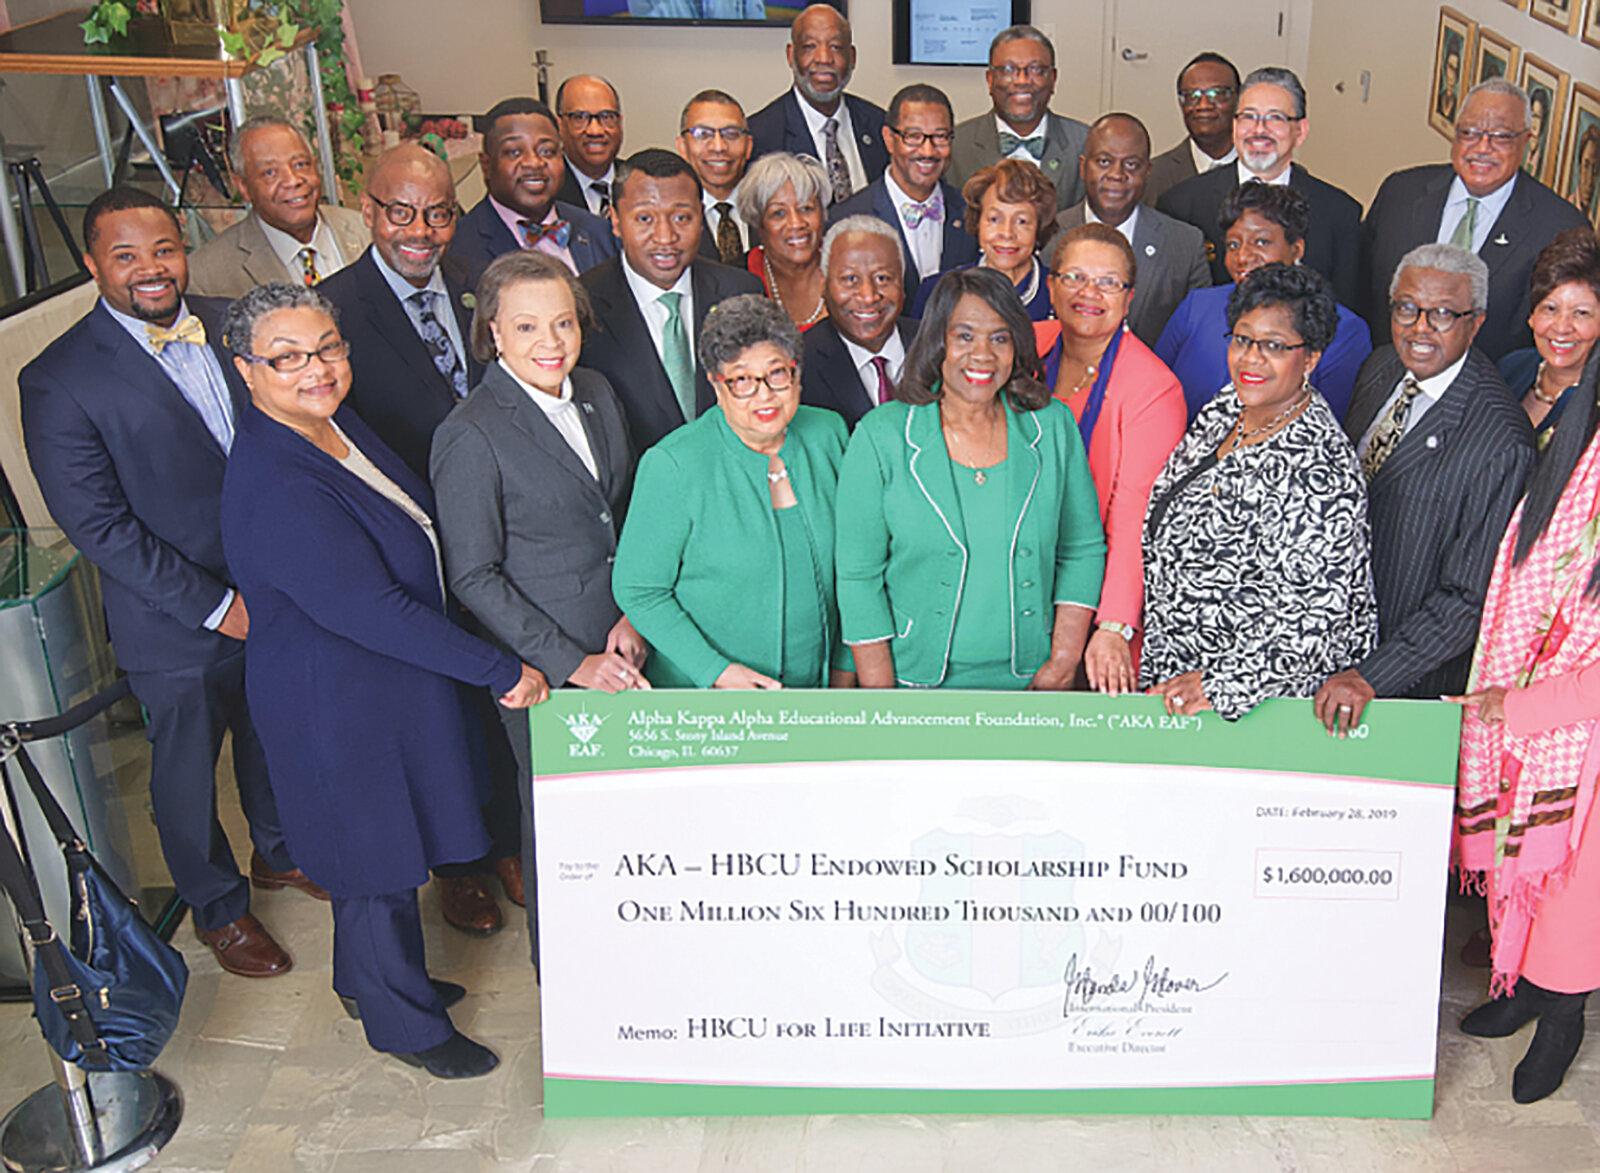 AKA Raises $1 Million for HBCUs in One Day. (Courtesy Photo)